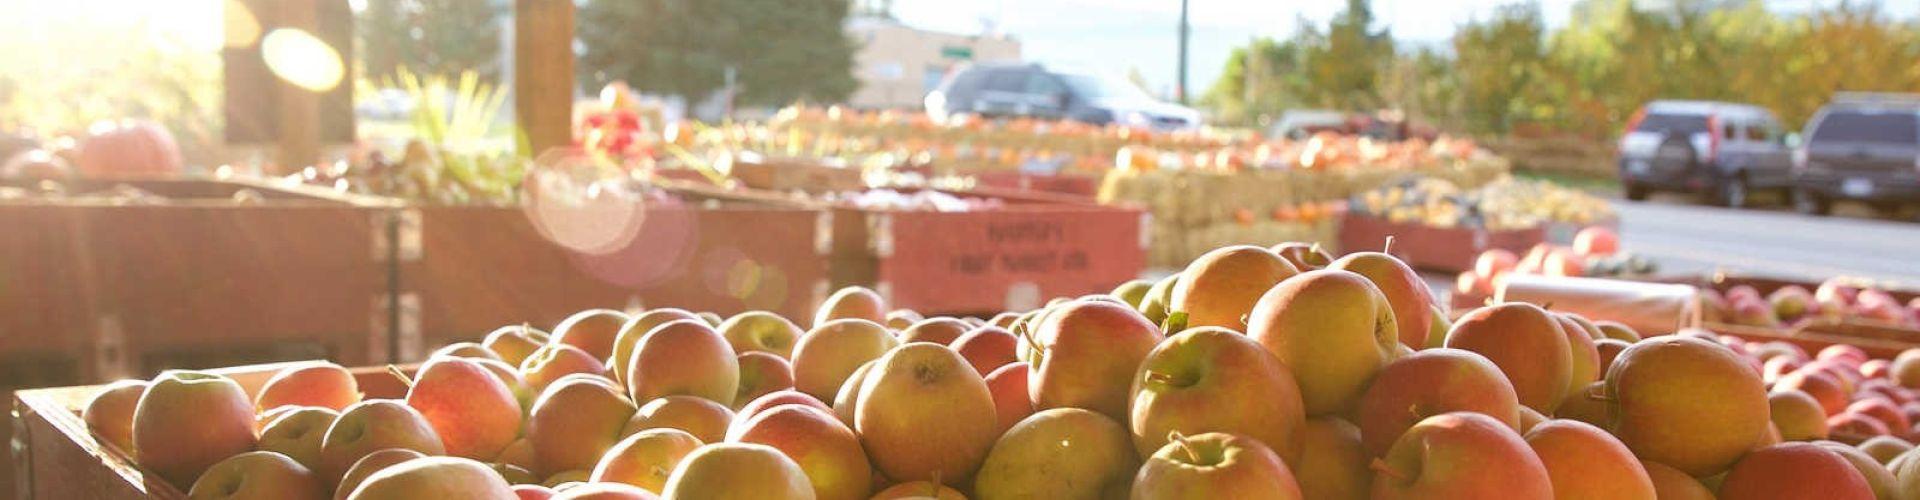 apple picking West Kelowna